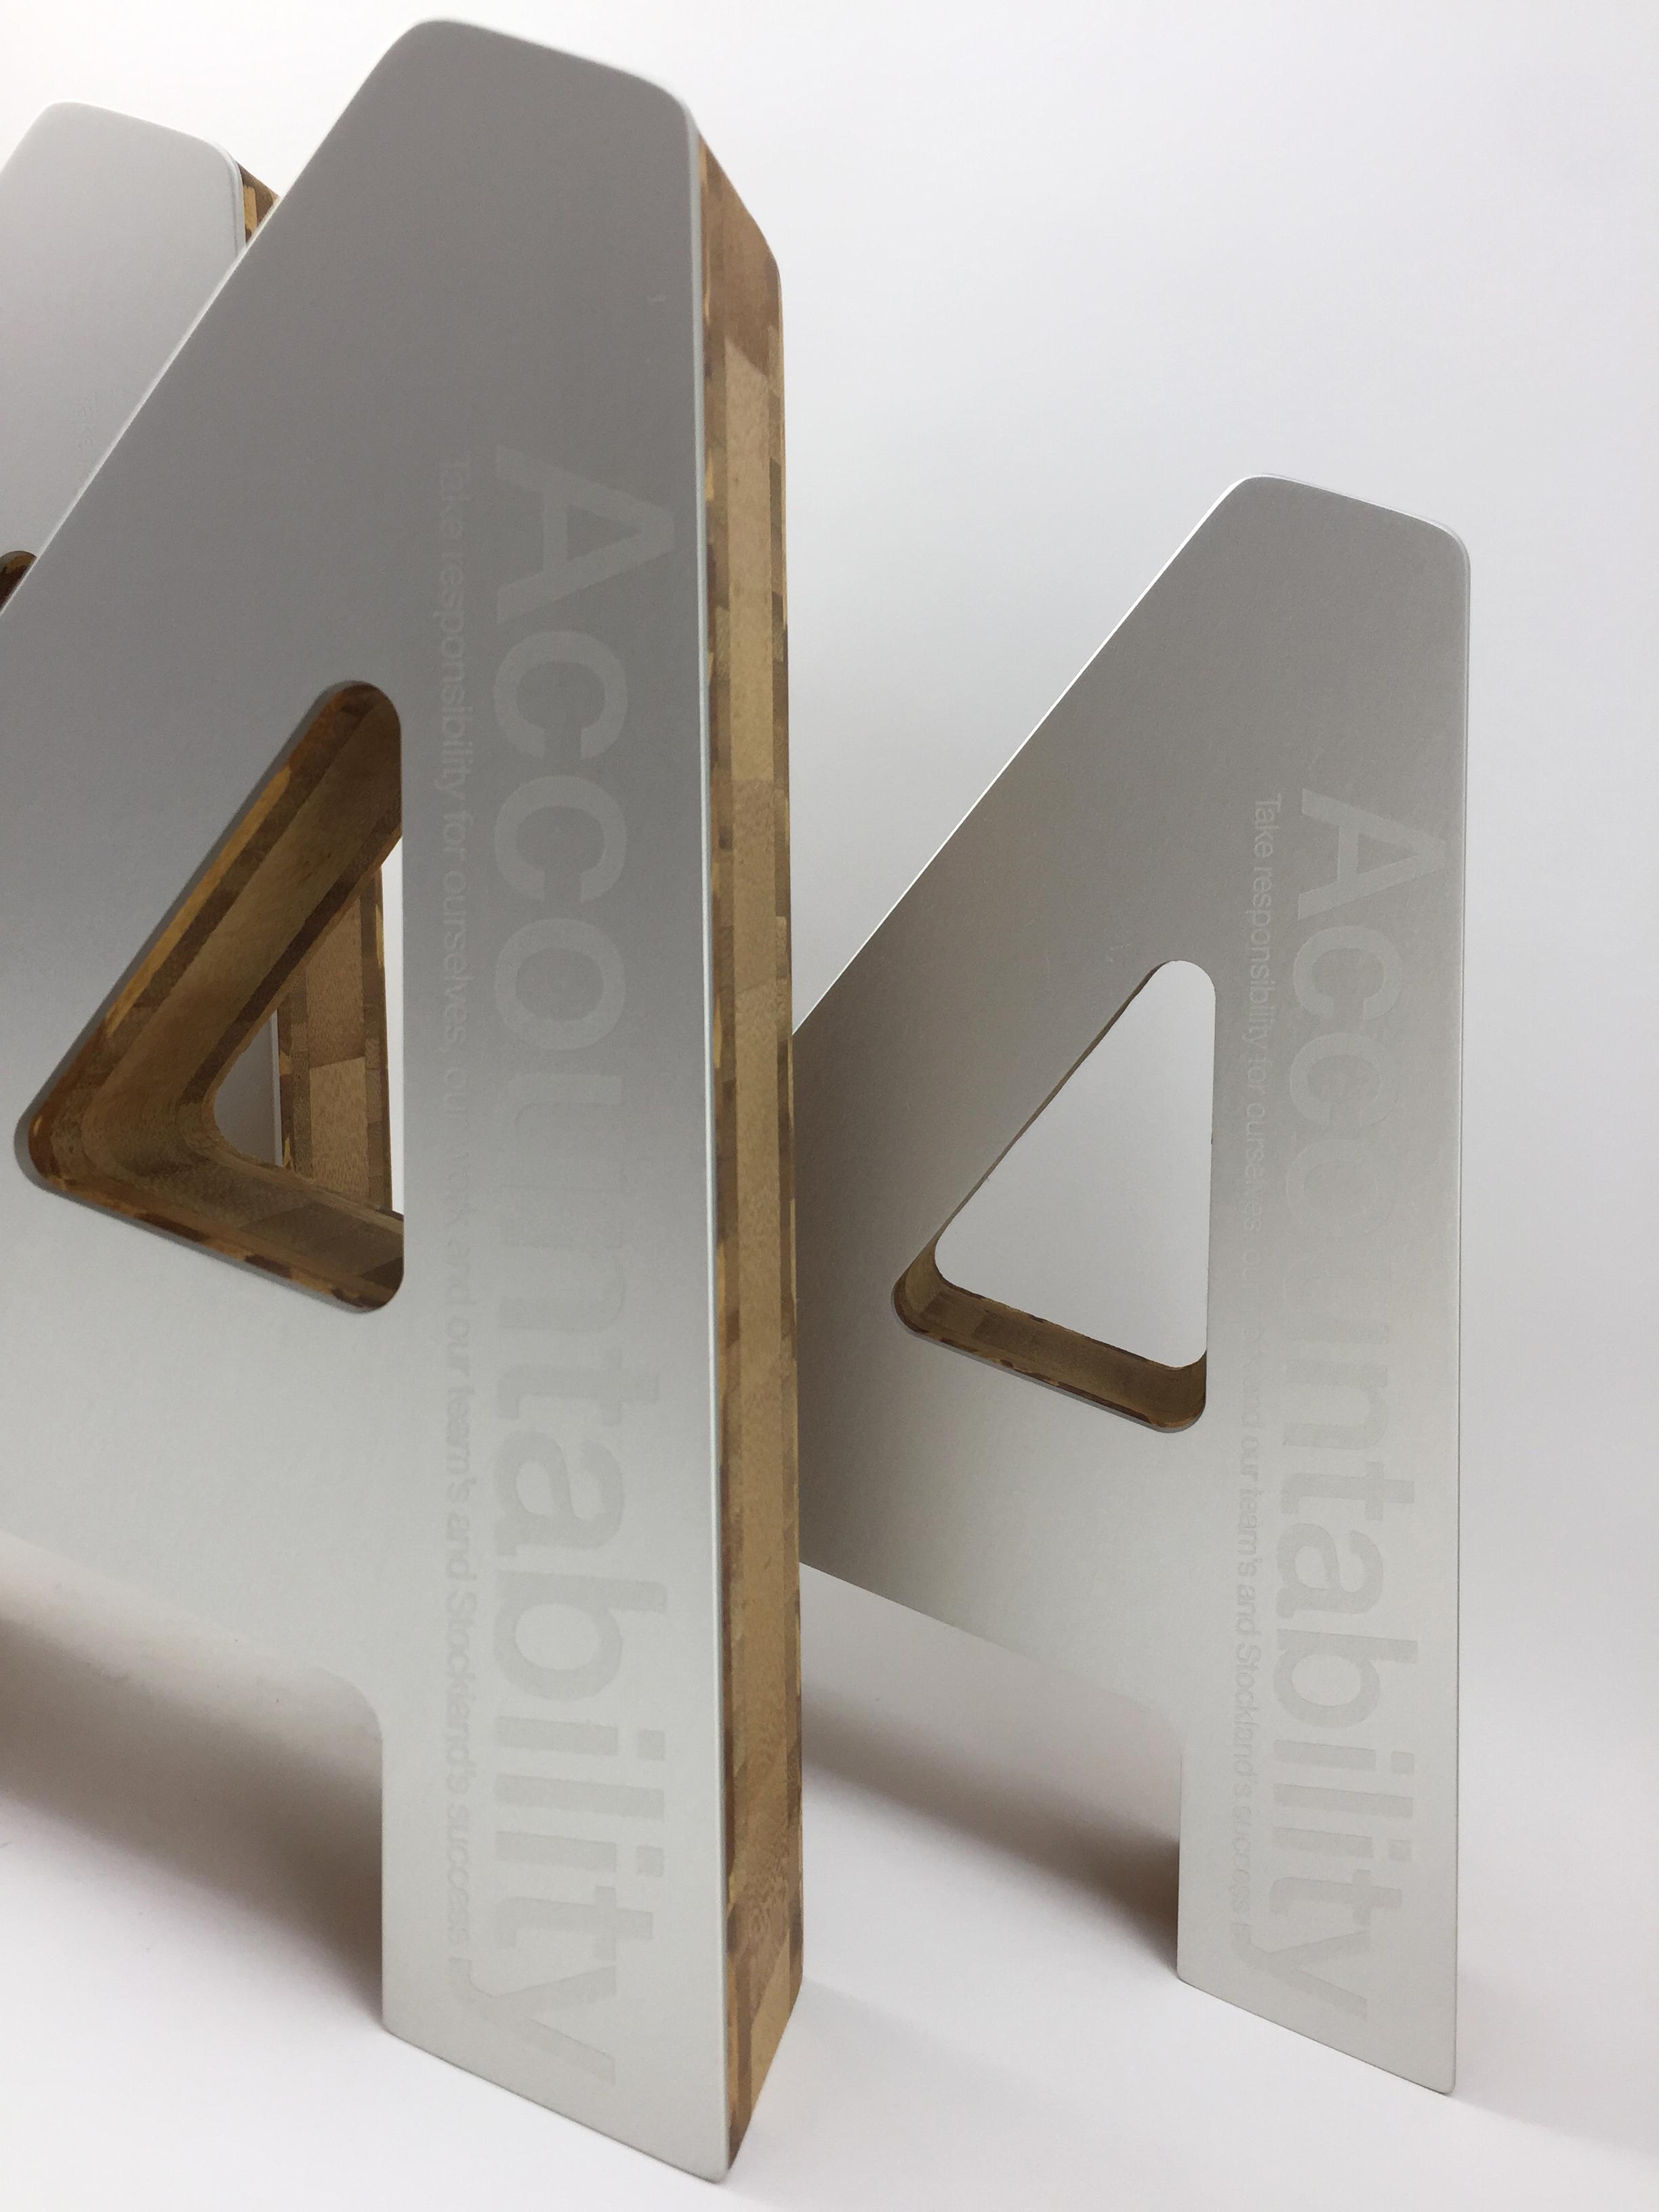 stockland-care-awards-eco-bamboo-plywood-timber-aluminium-trophy-07.jpg